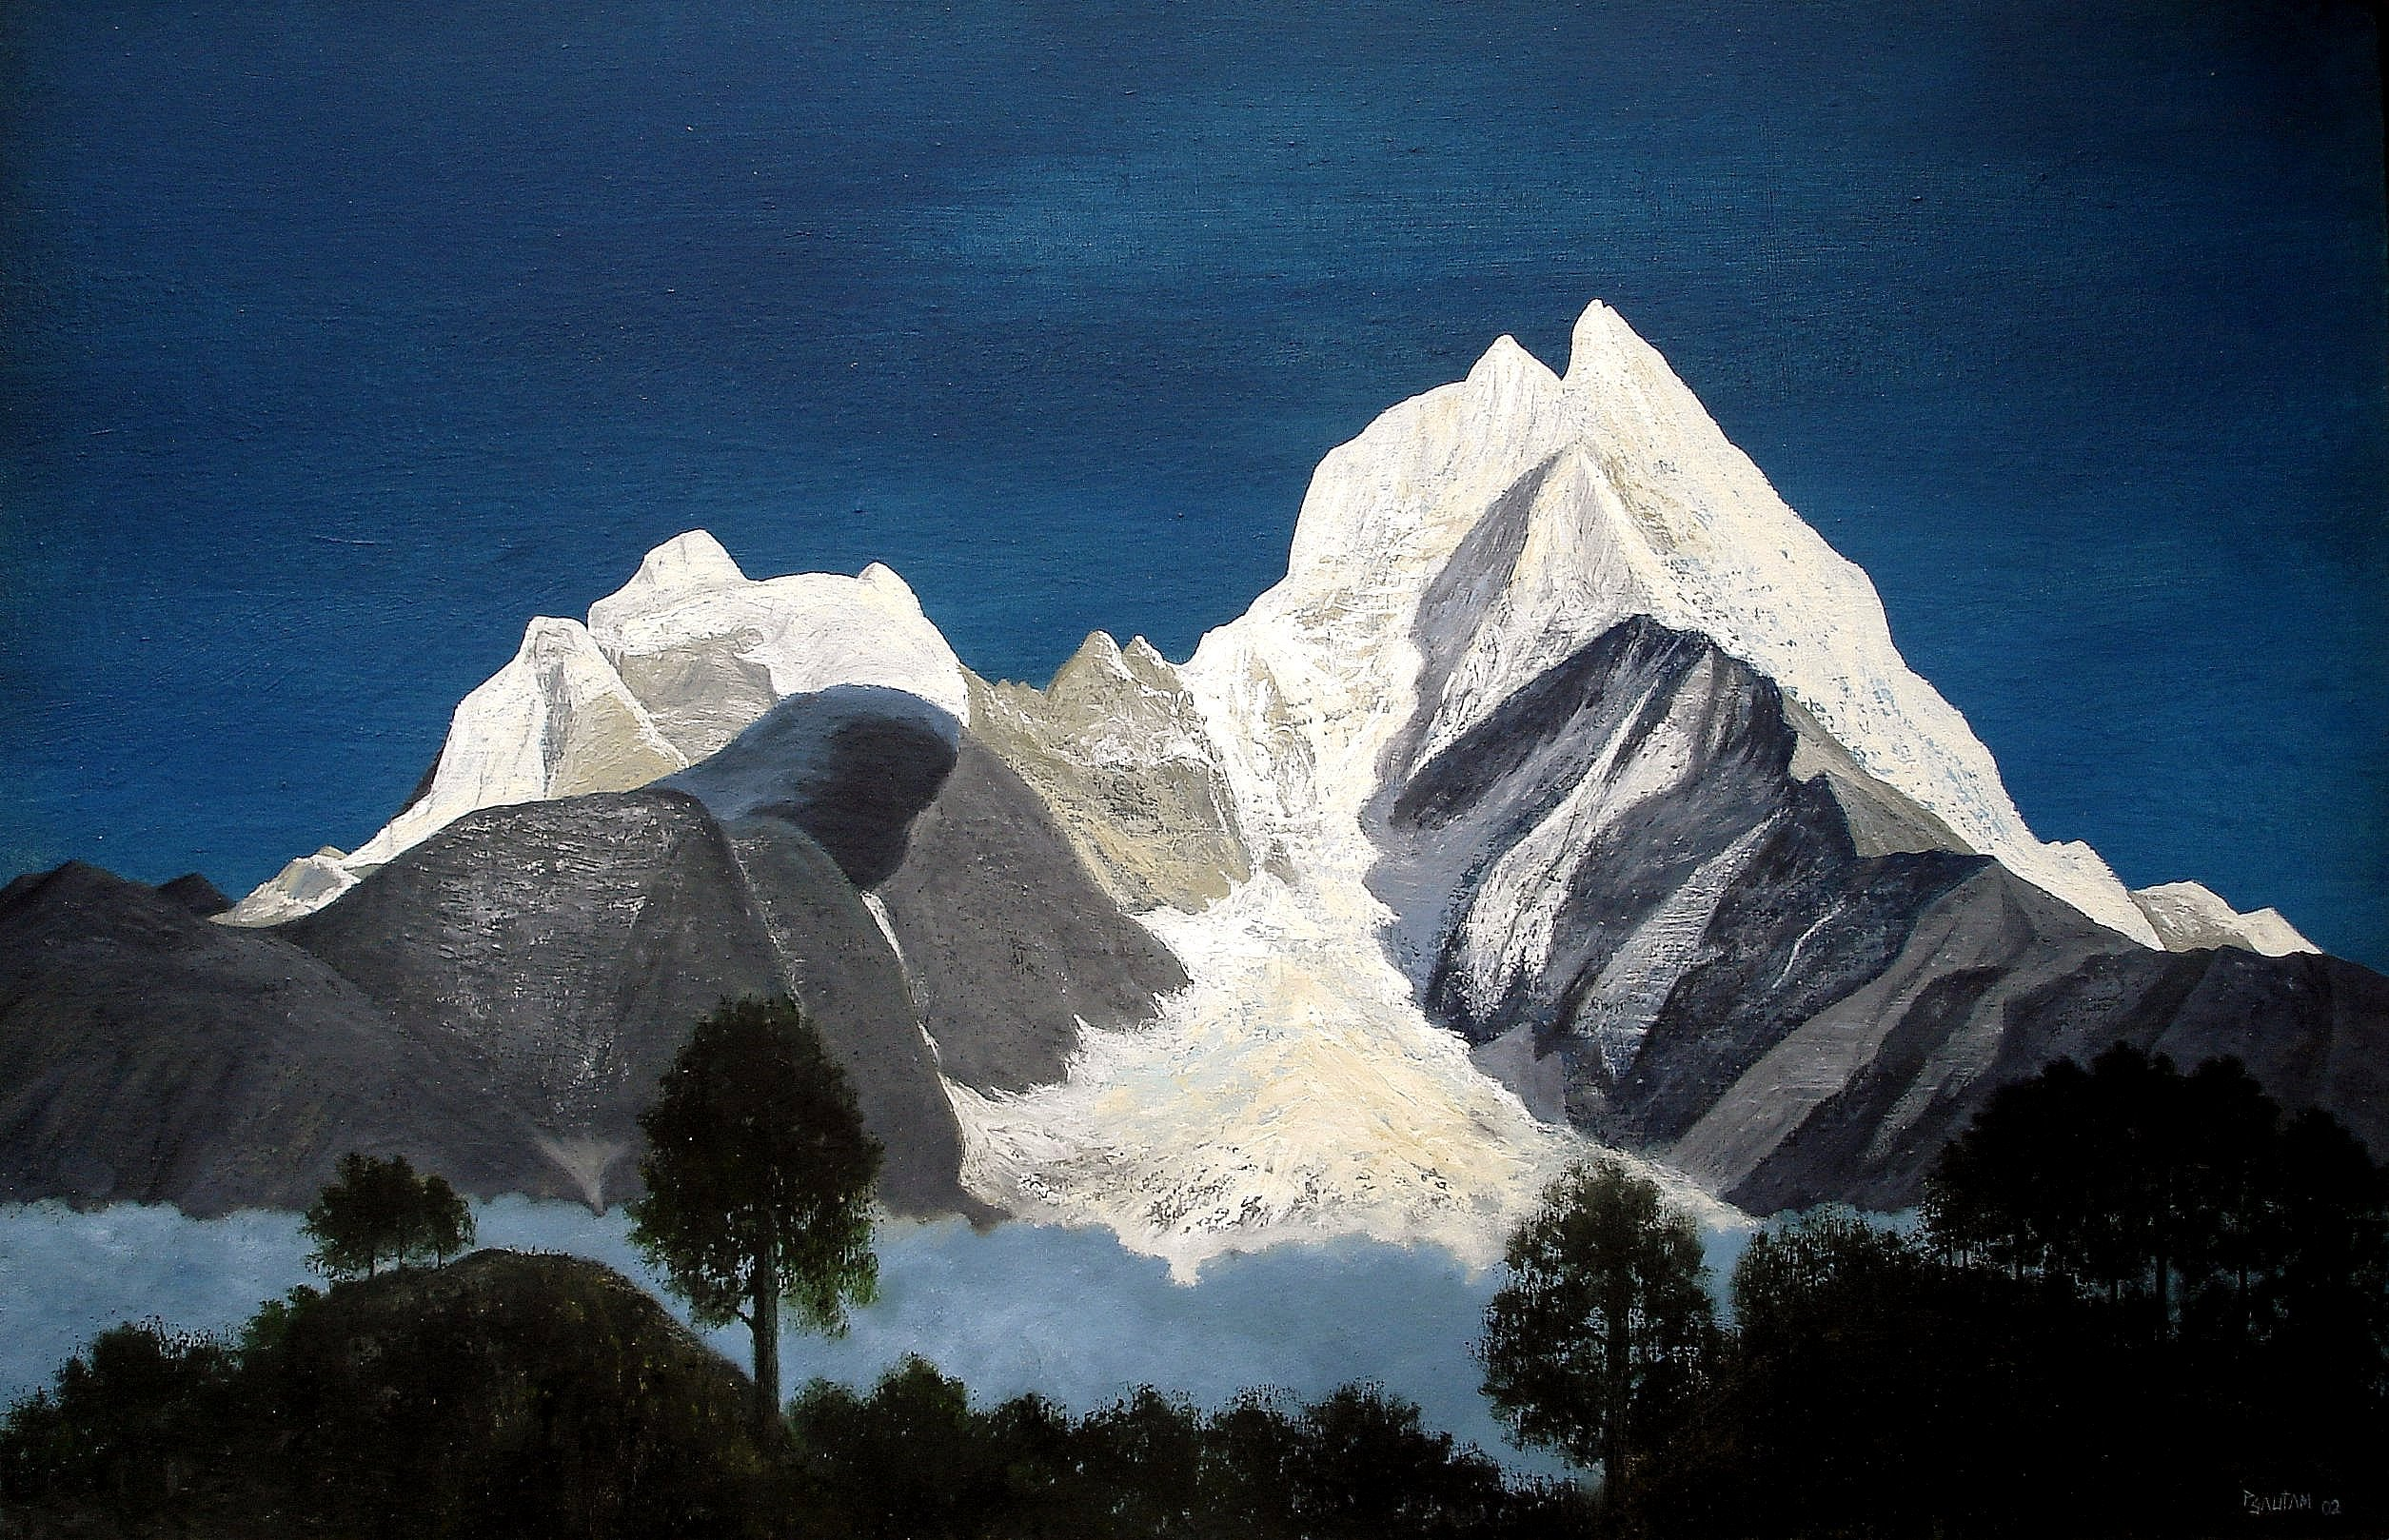 himalaya en la maana wallpaper   ForWallpapercom 2510x1618